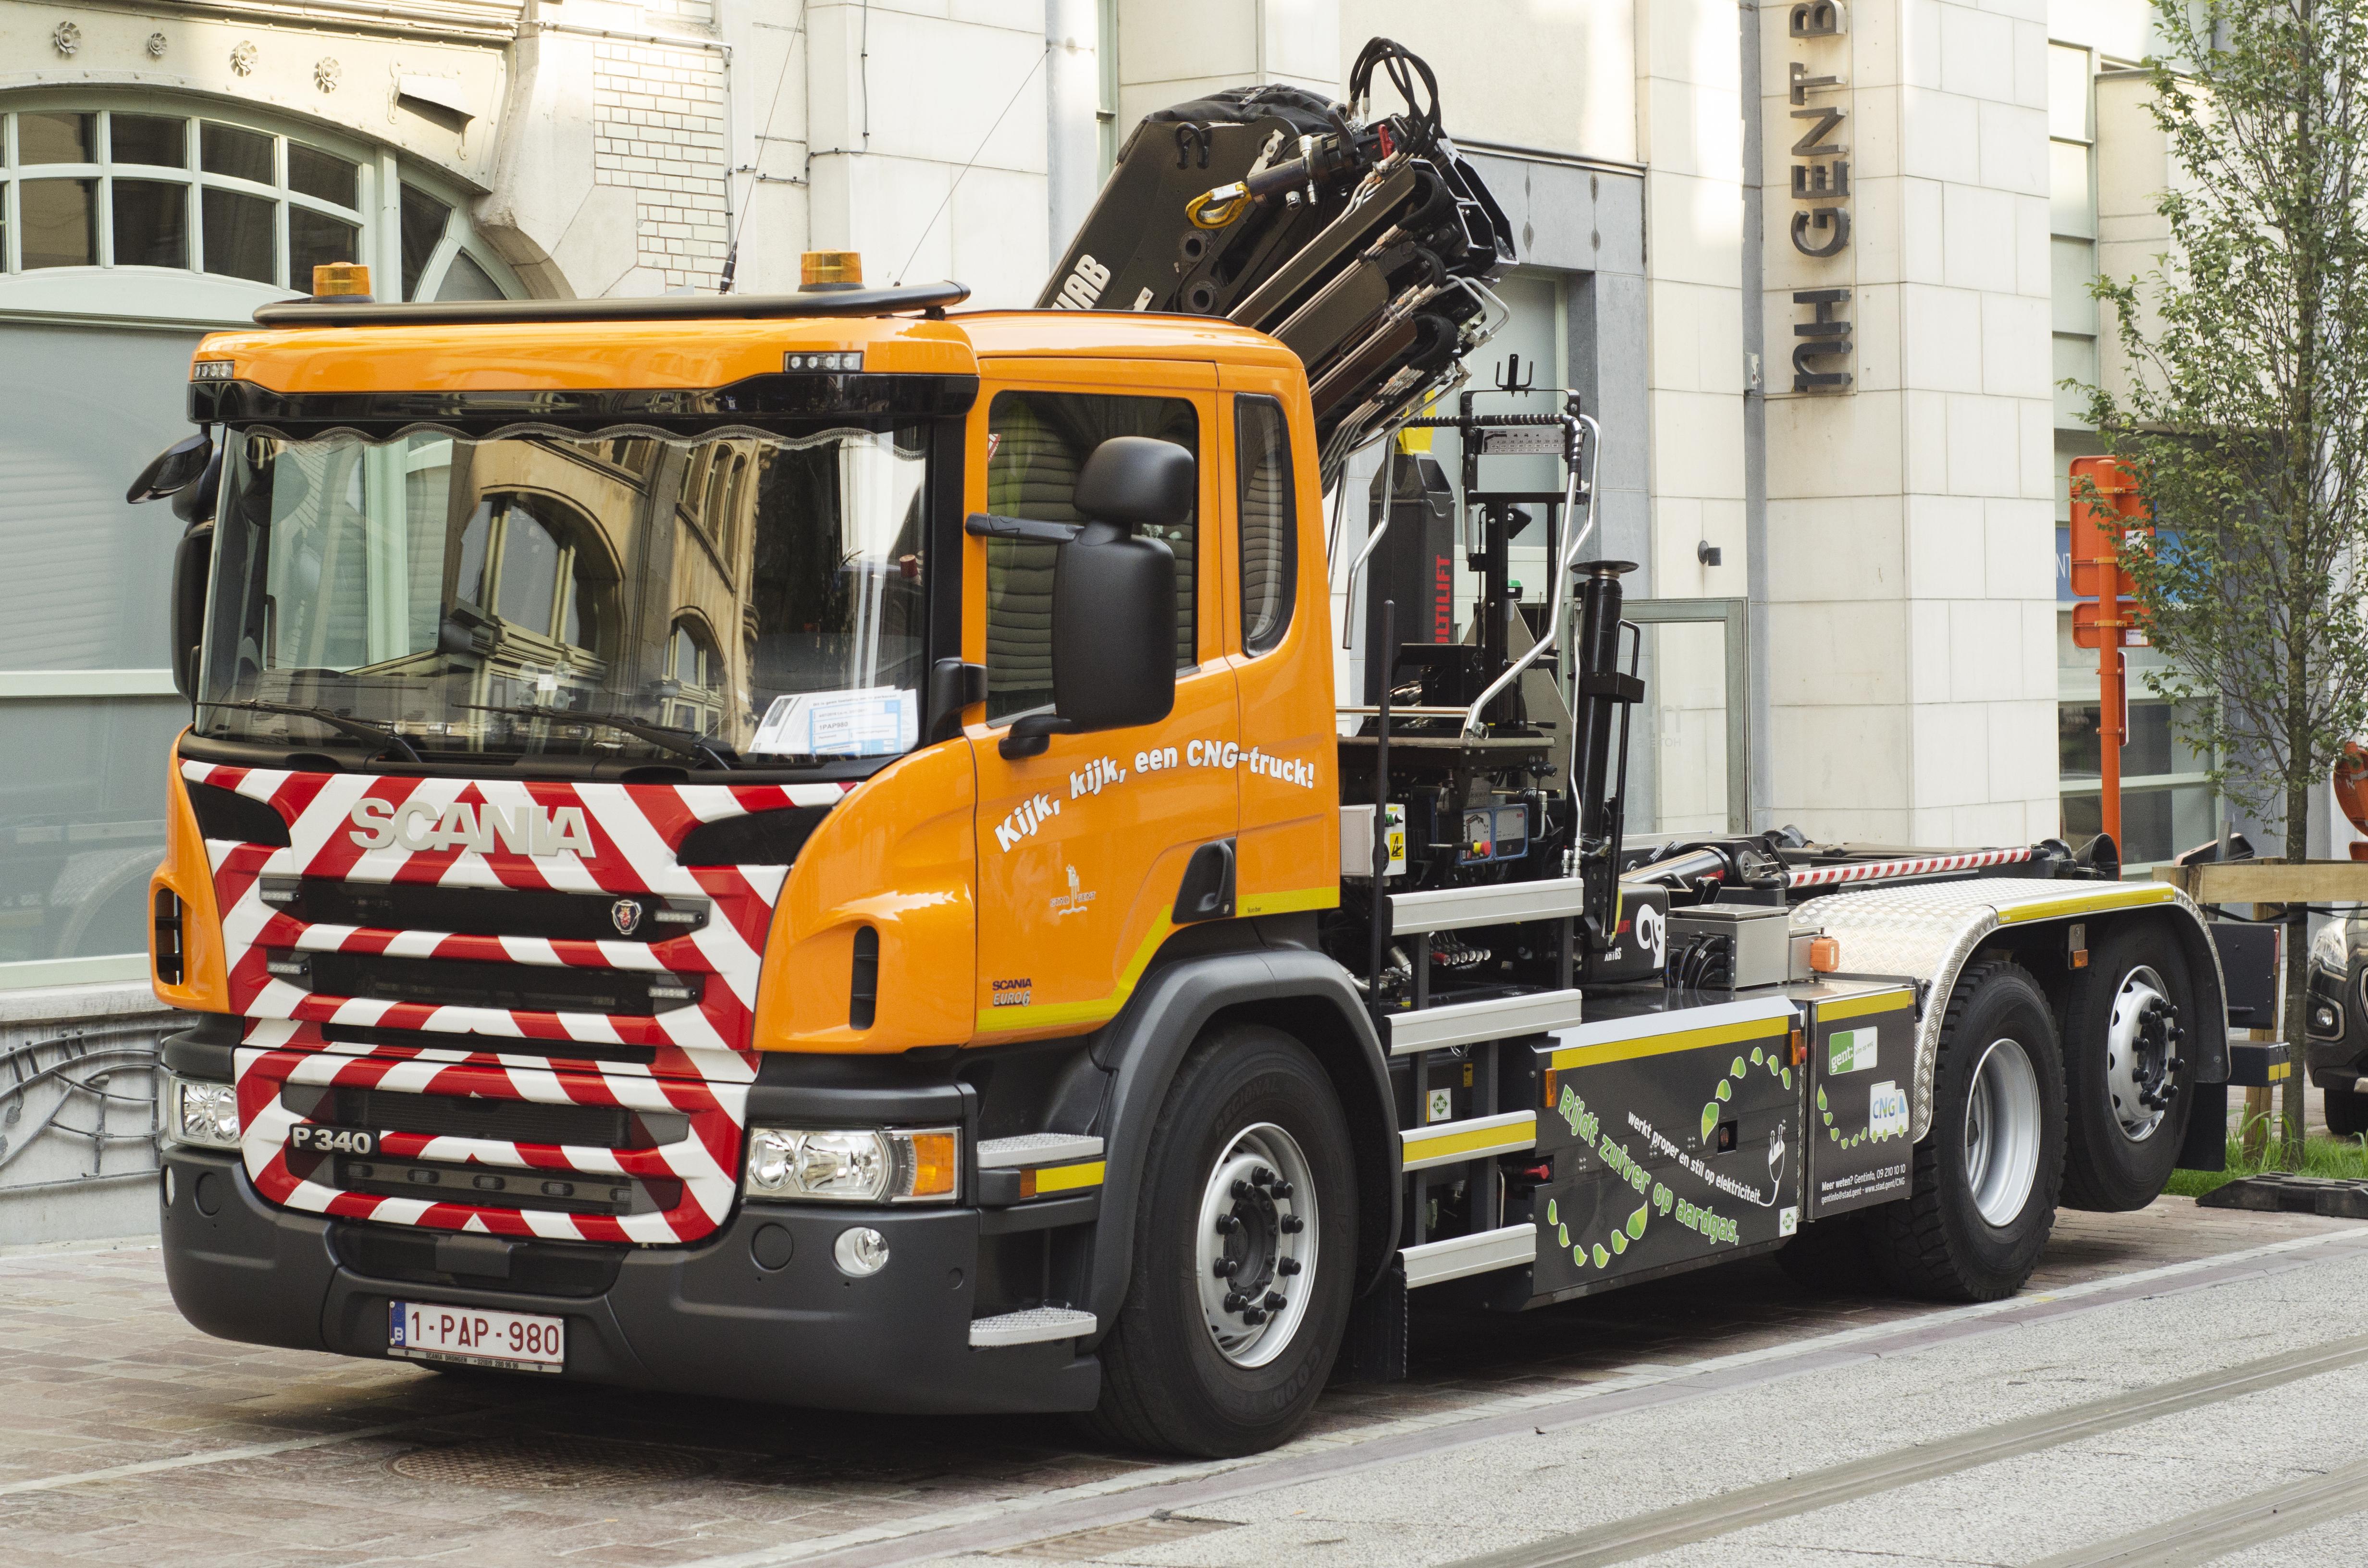 20160826_AV_foto persvoorstelling CNG vrachtwagen hybride kraan 1.jpg